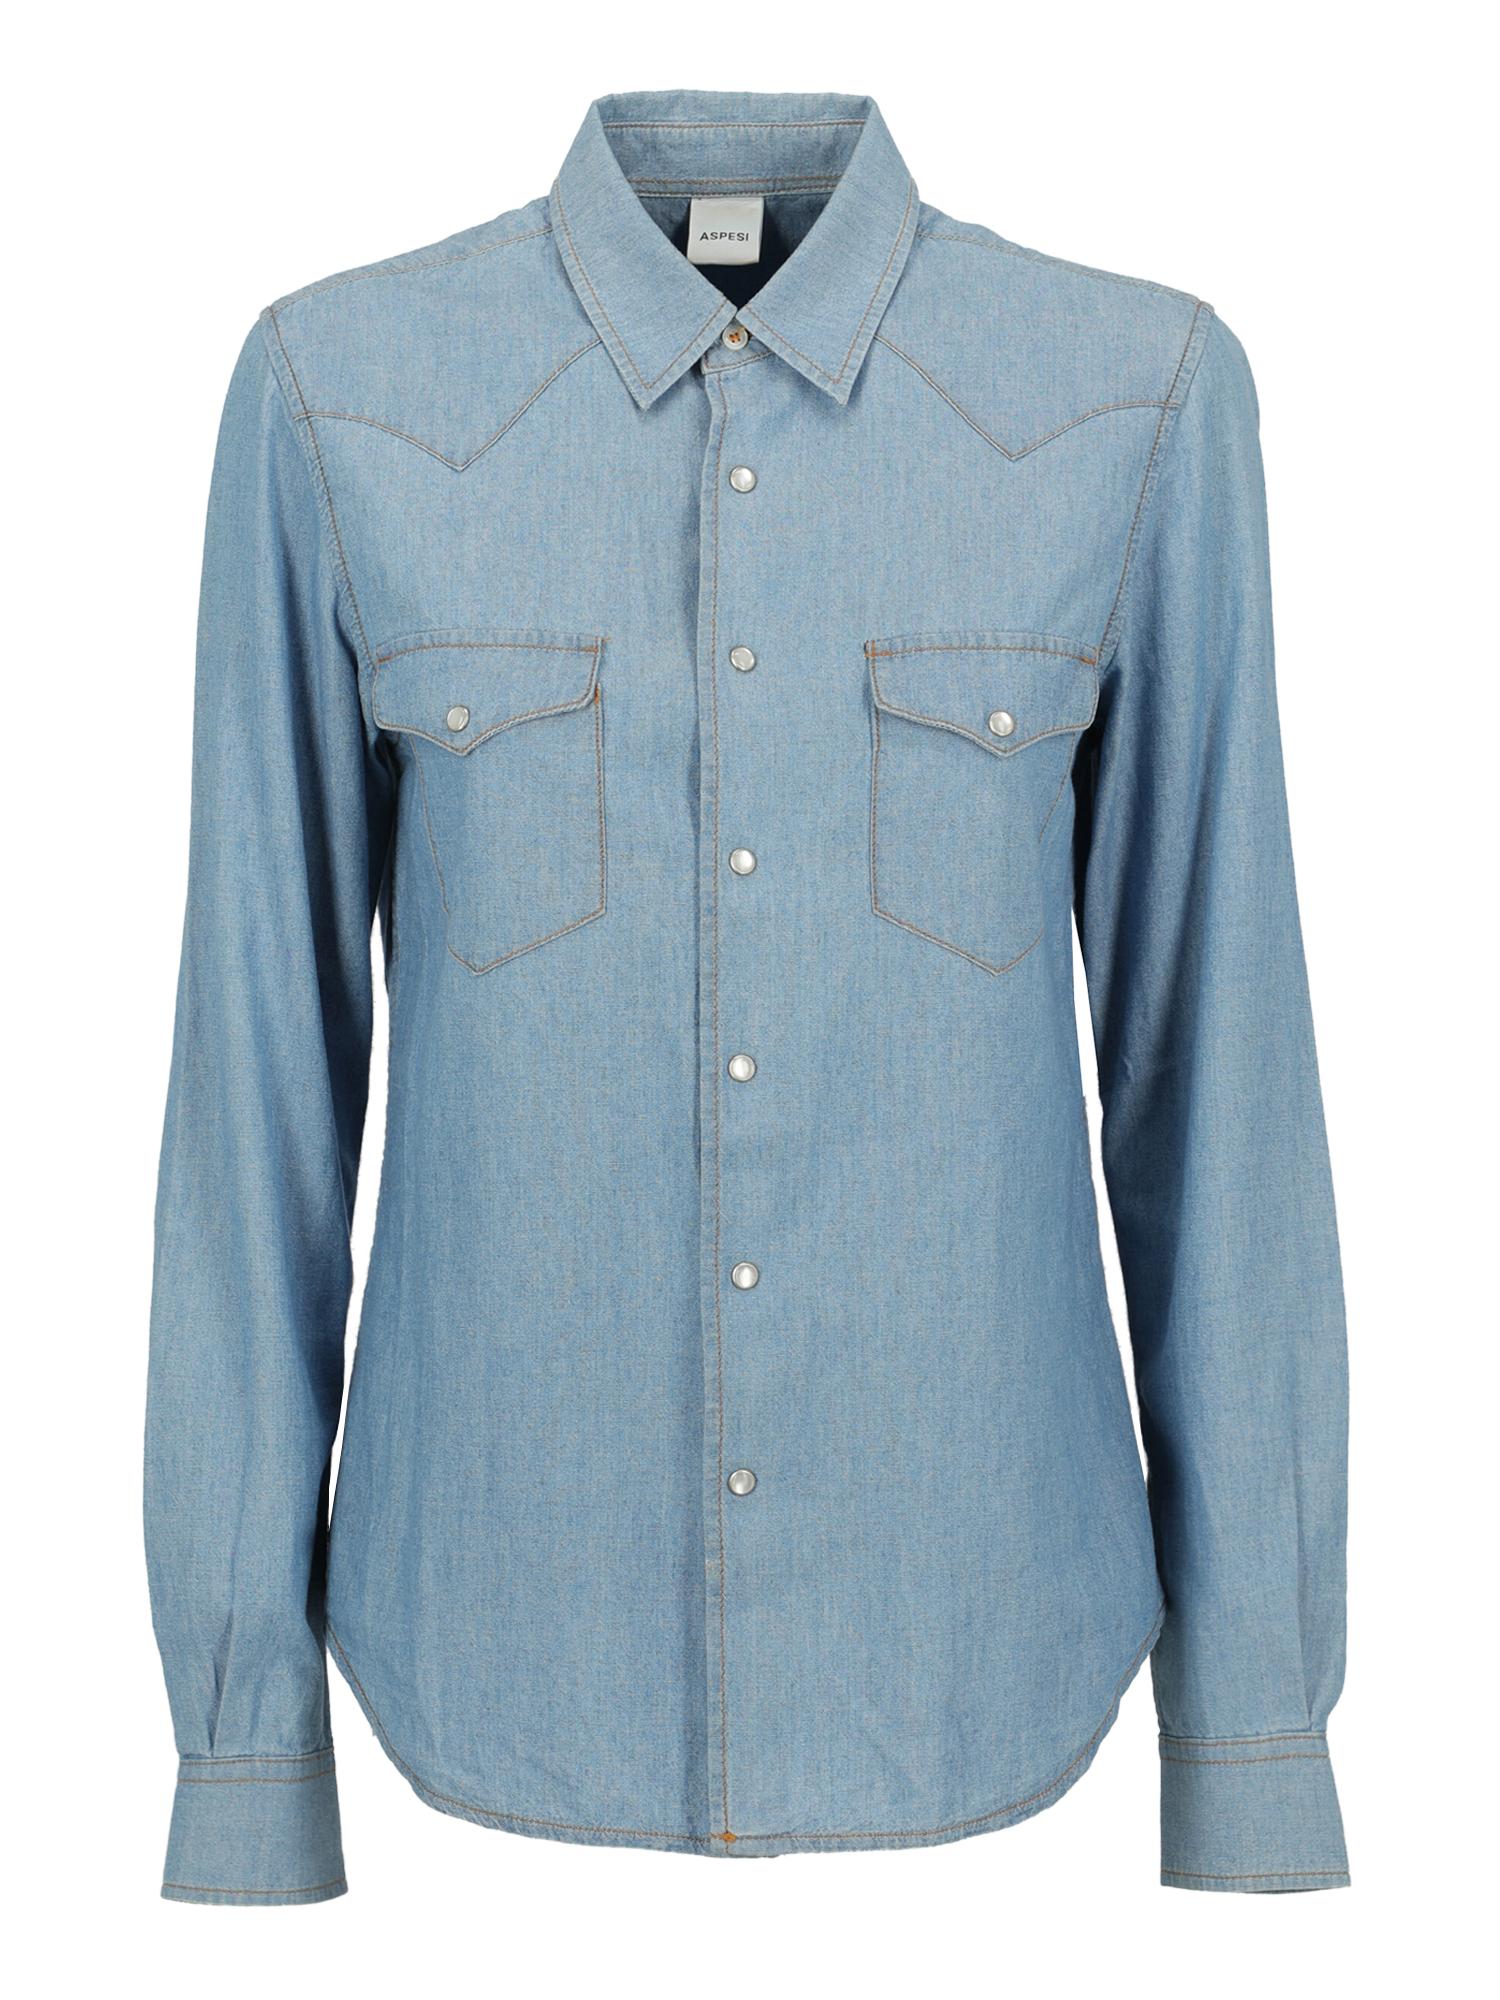 Pre-owned Aspesi Clothing In Blue